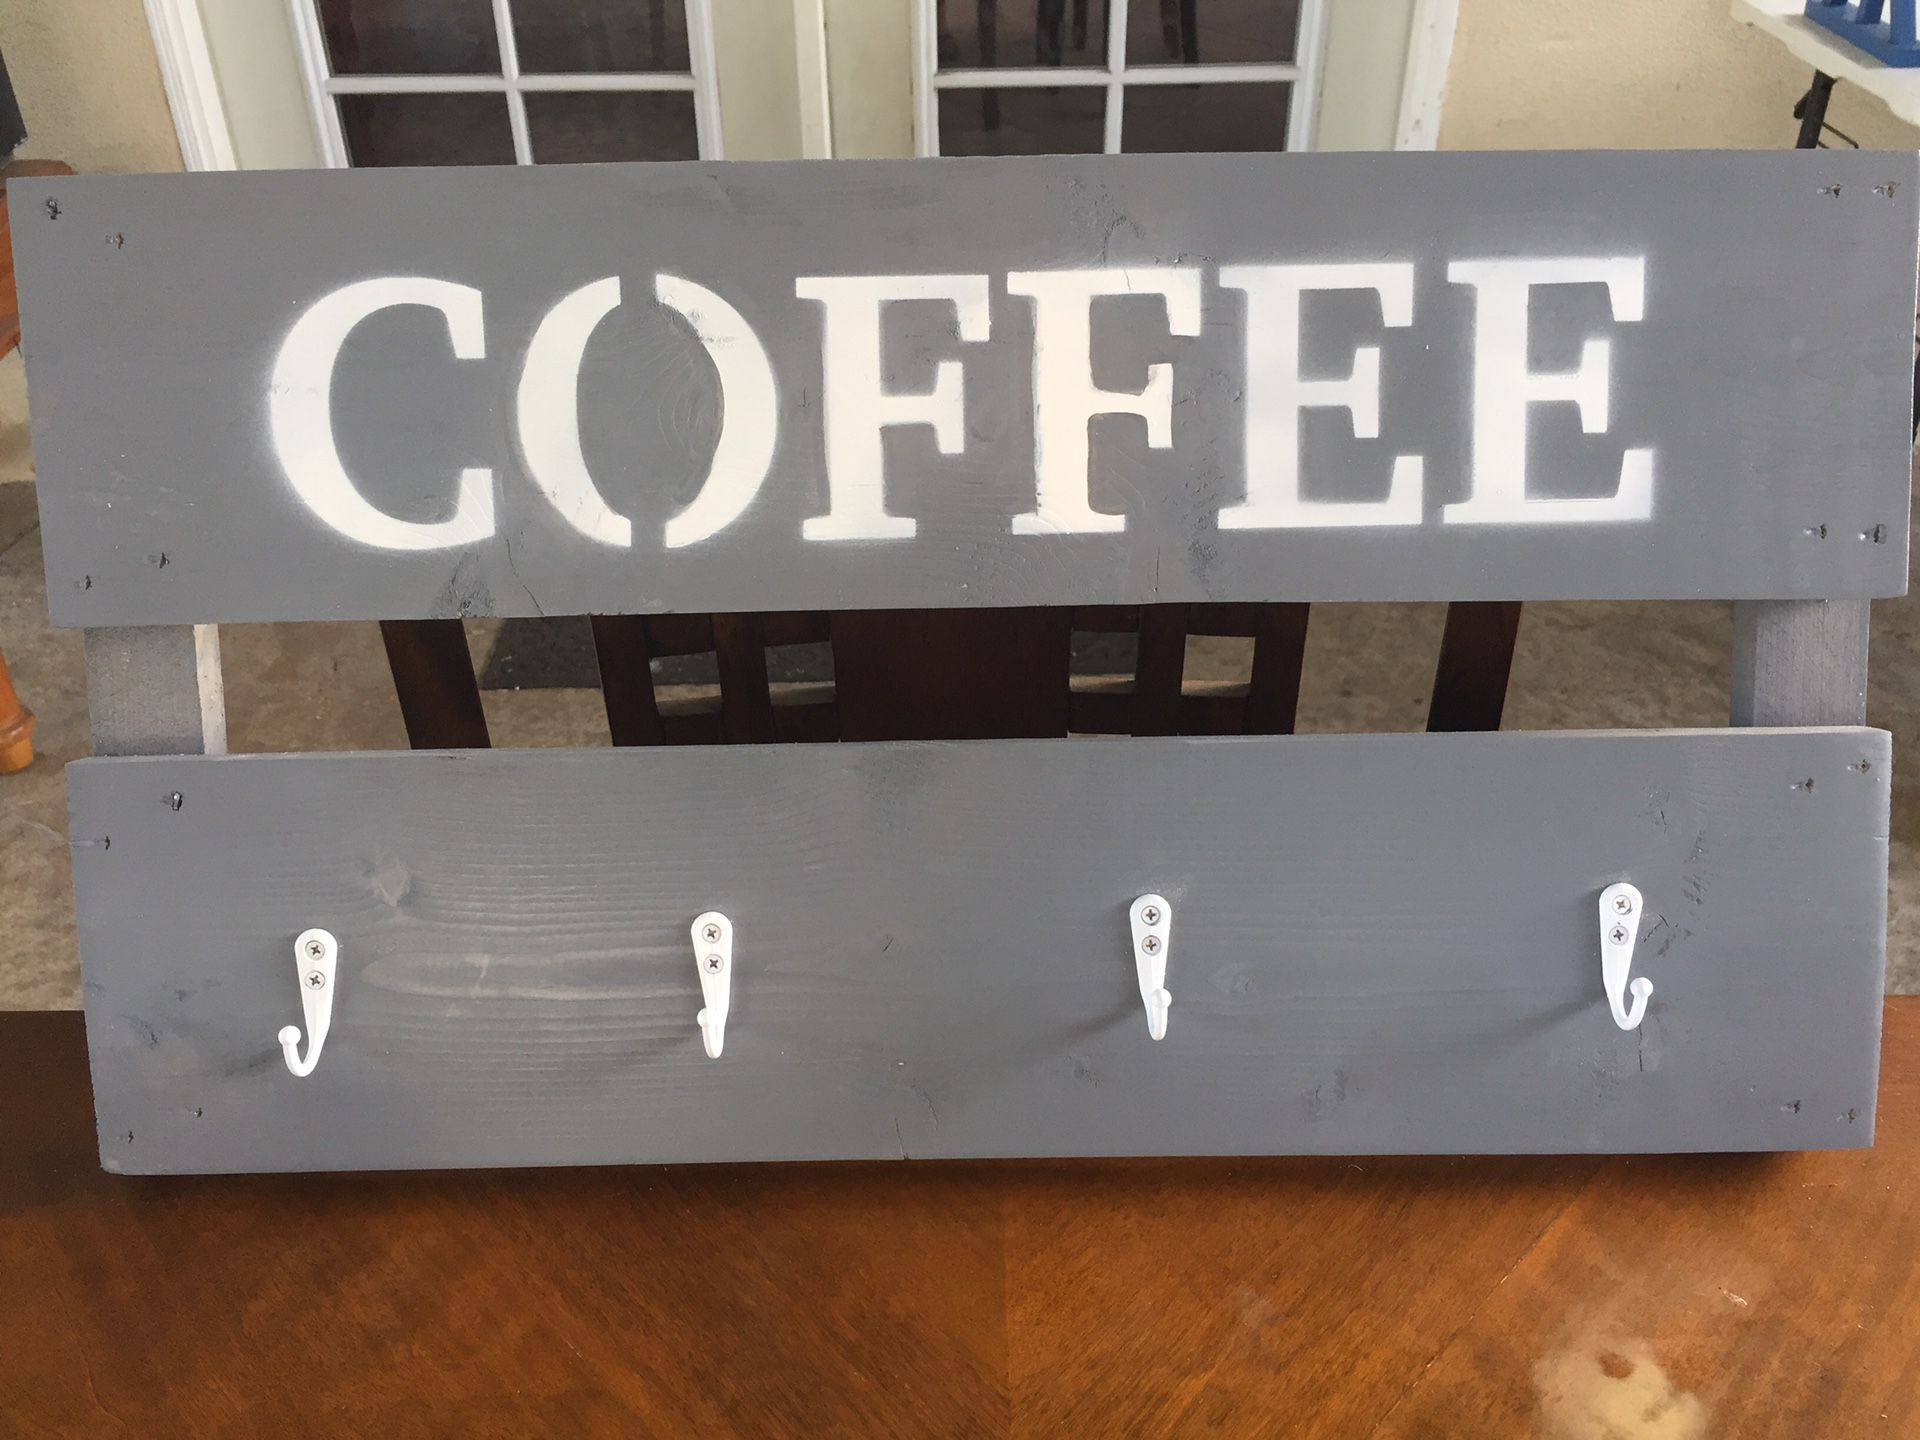 Coffee rack holder